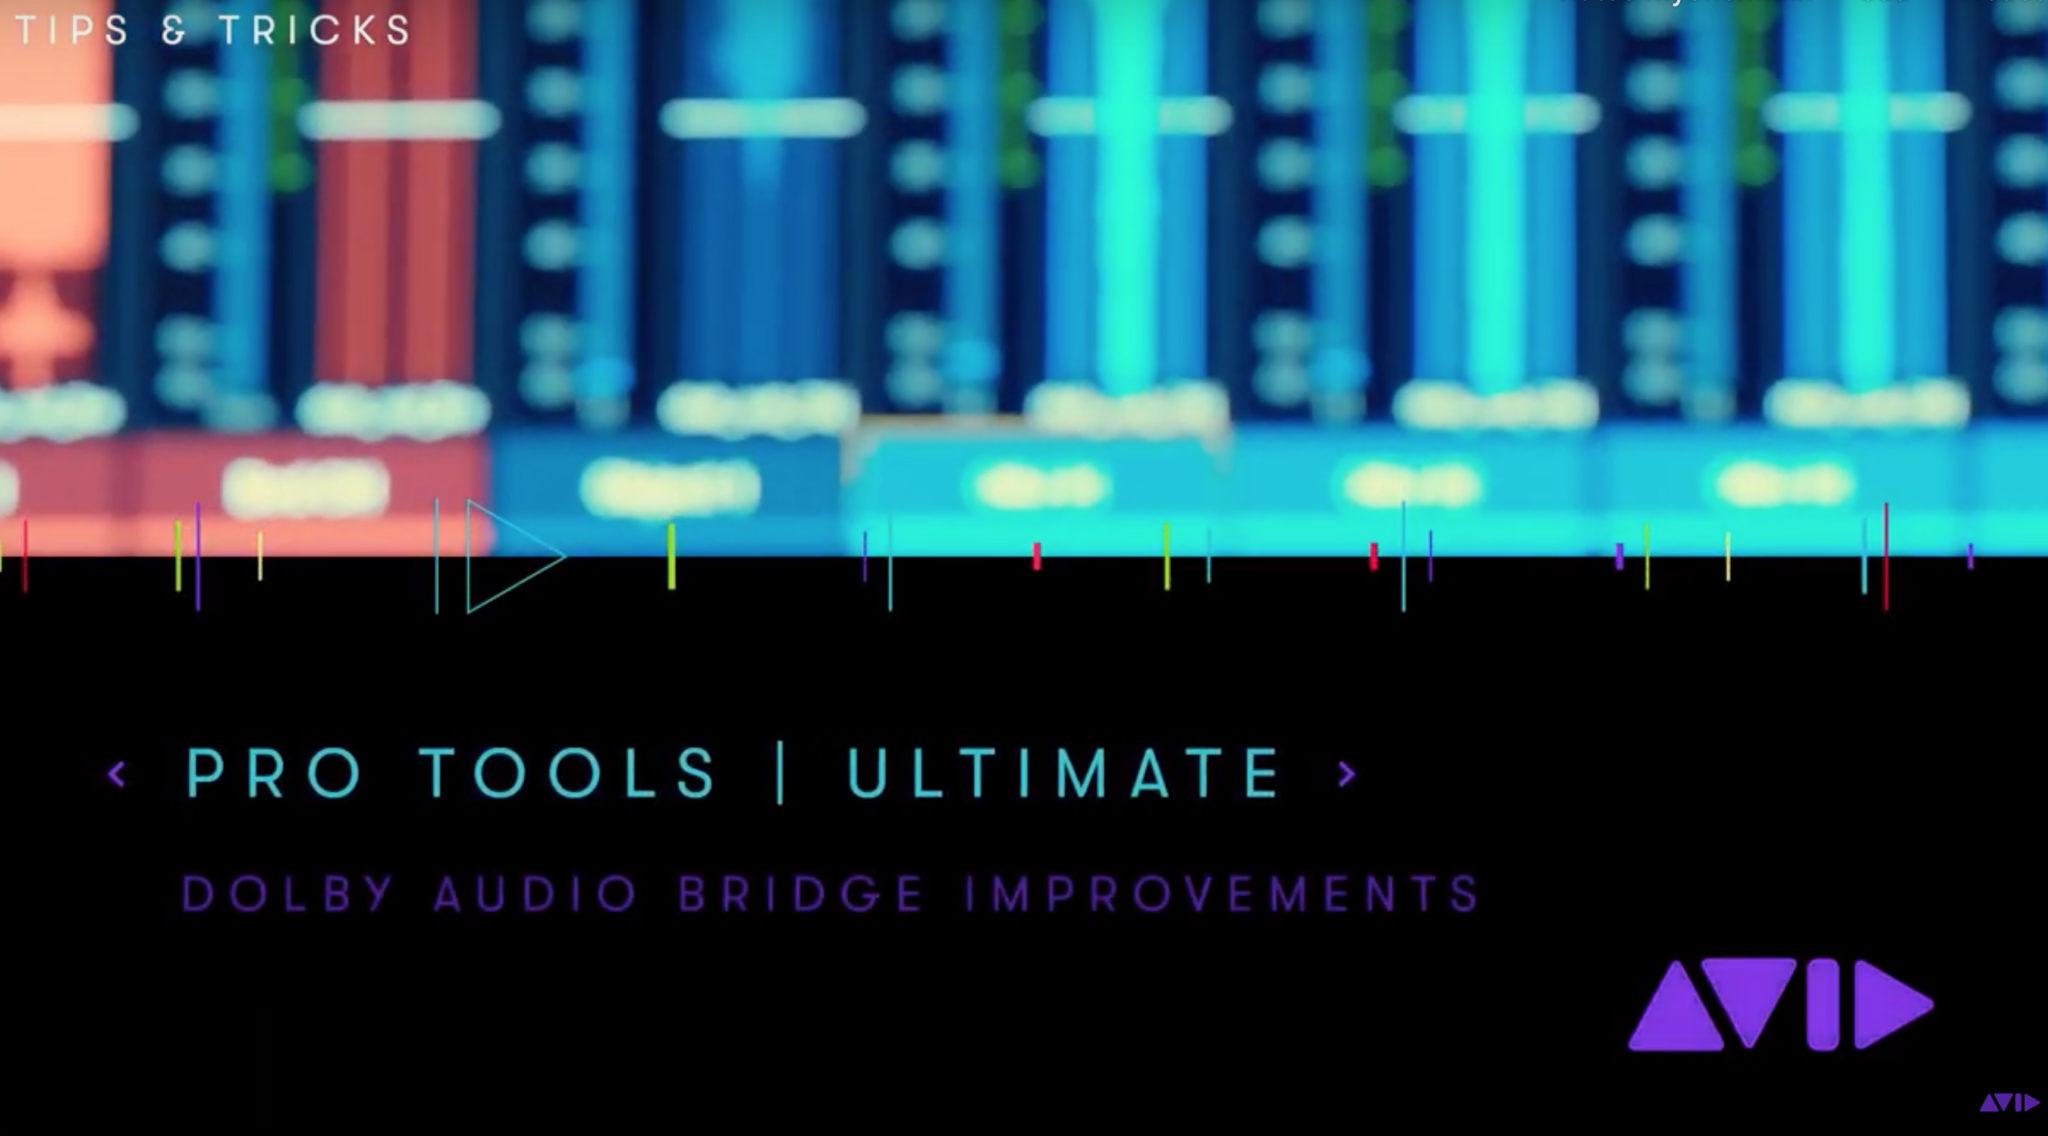 pro tools 2019.10